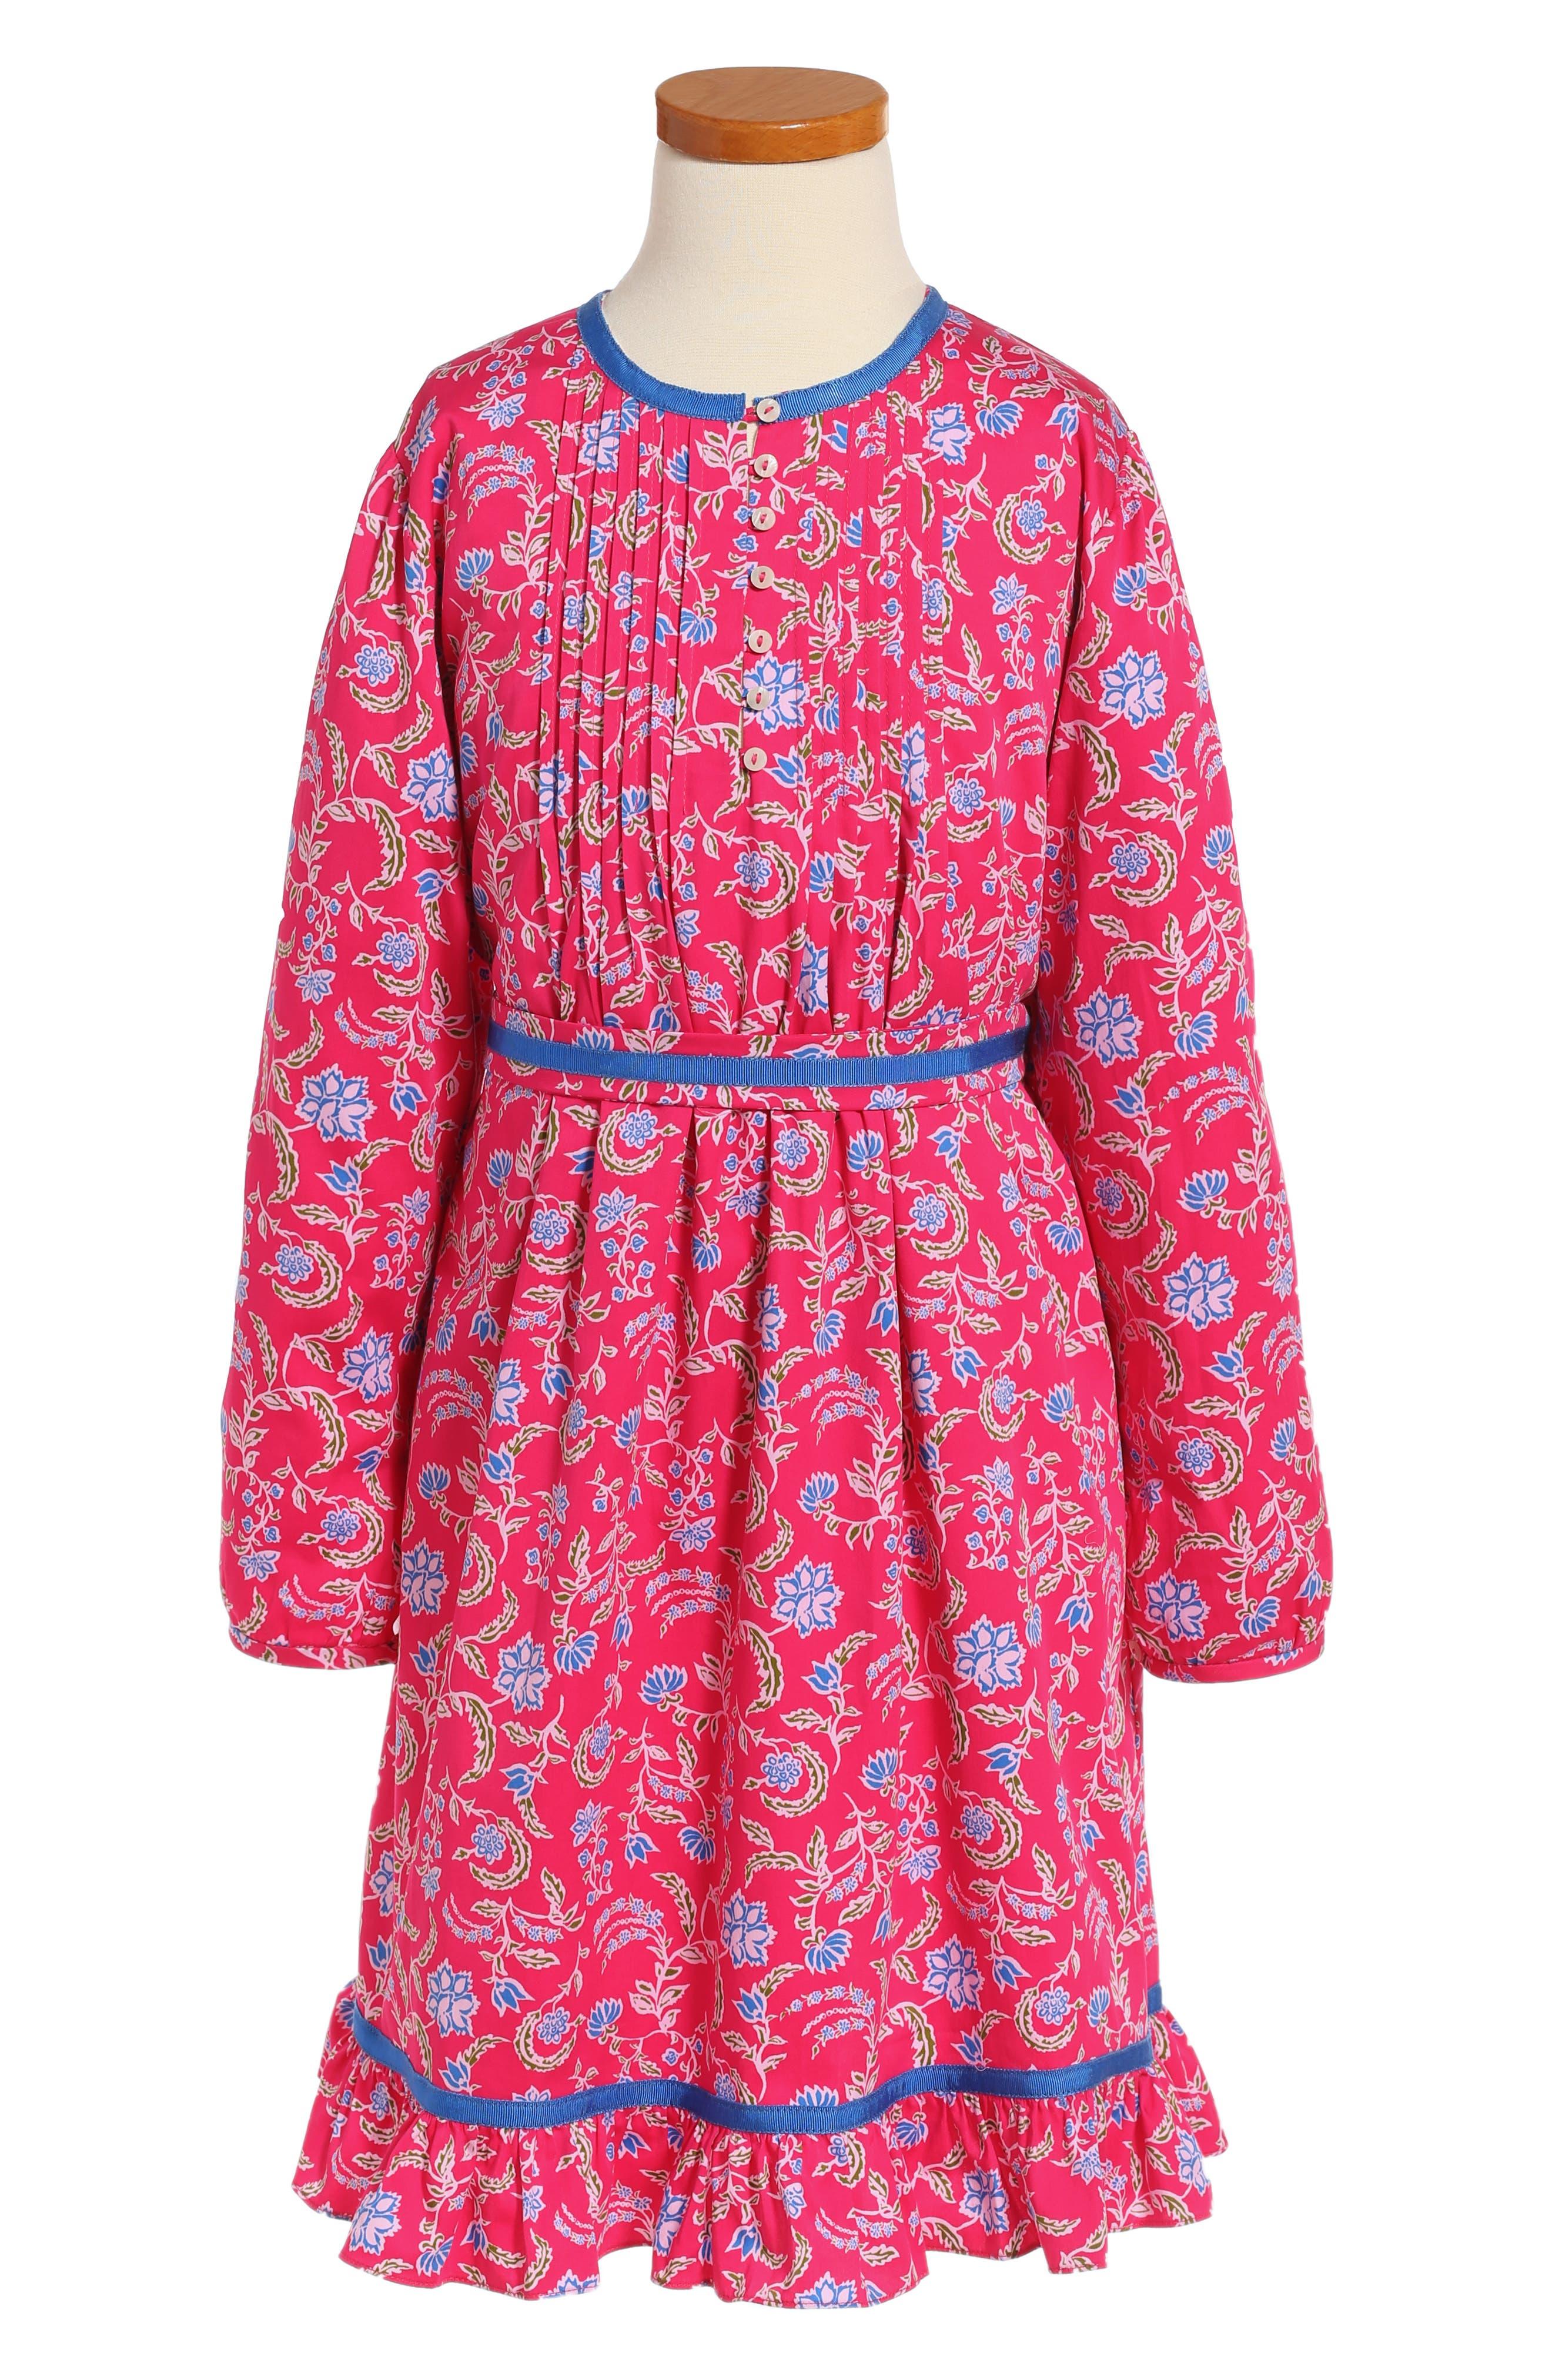 Lotus Flower Dress,                             Main thumbnail 1, color,                             696